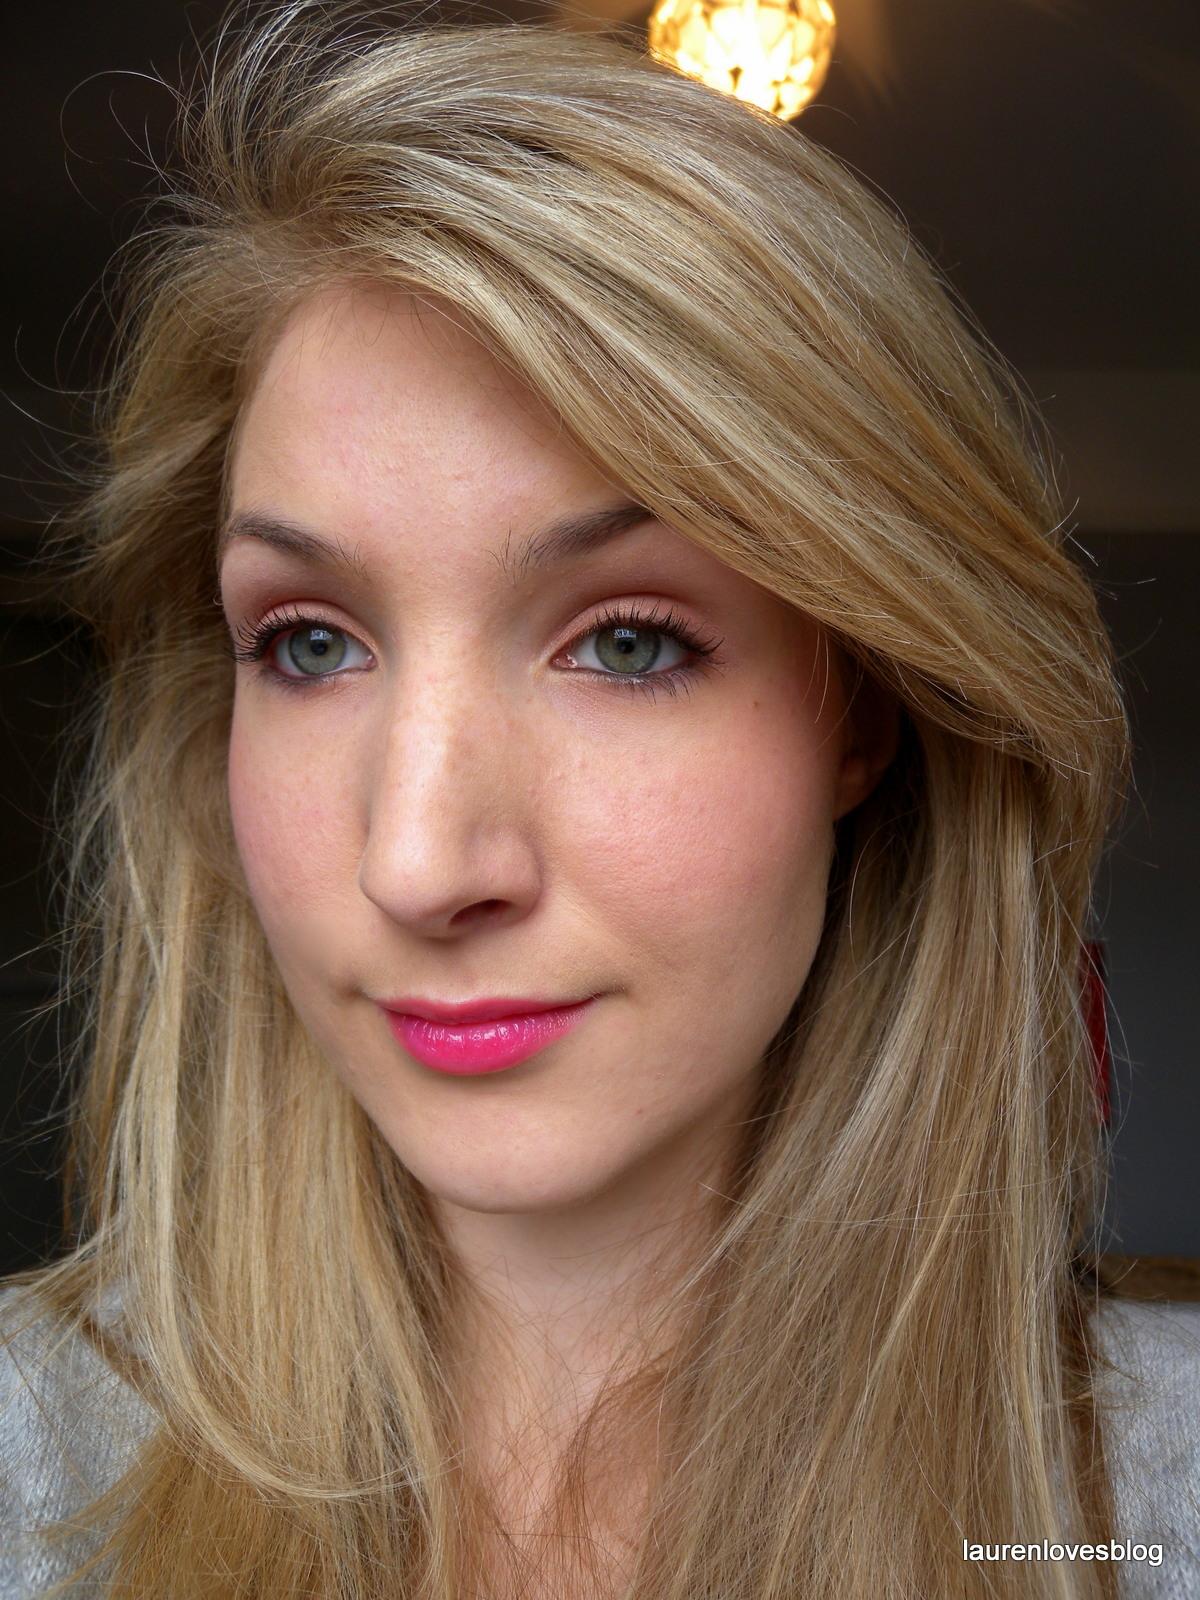 Laurenlovesmakeup Xoxo Primark Pound Fashion Nails: Review: 17 Berry Crush Lipstain